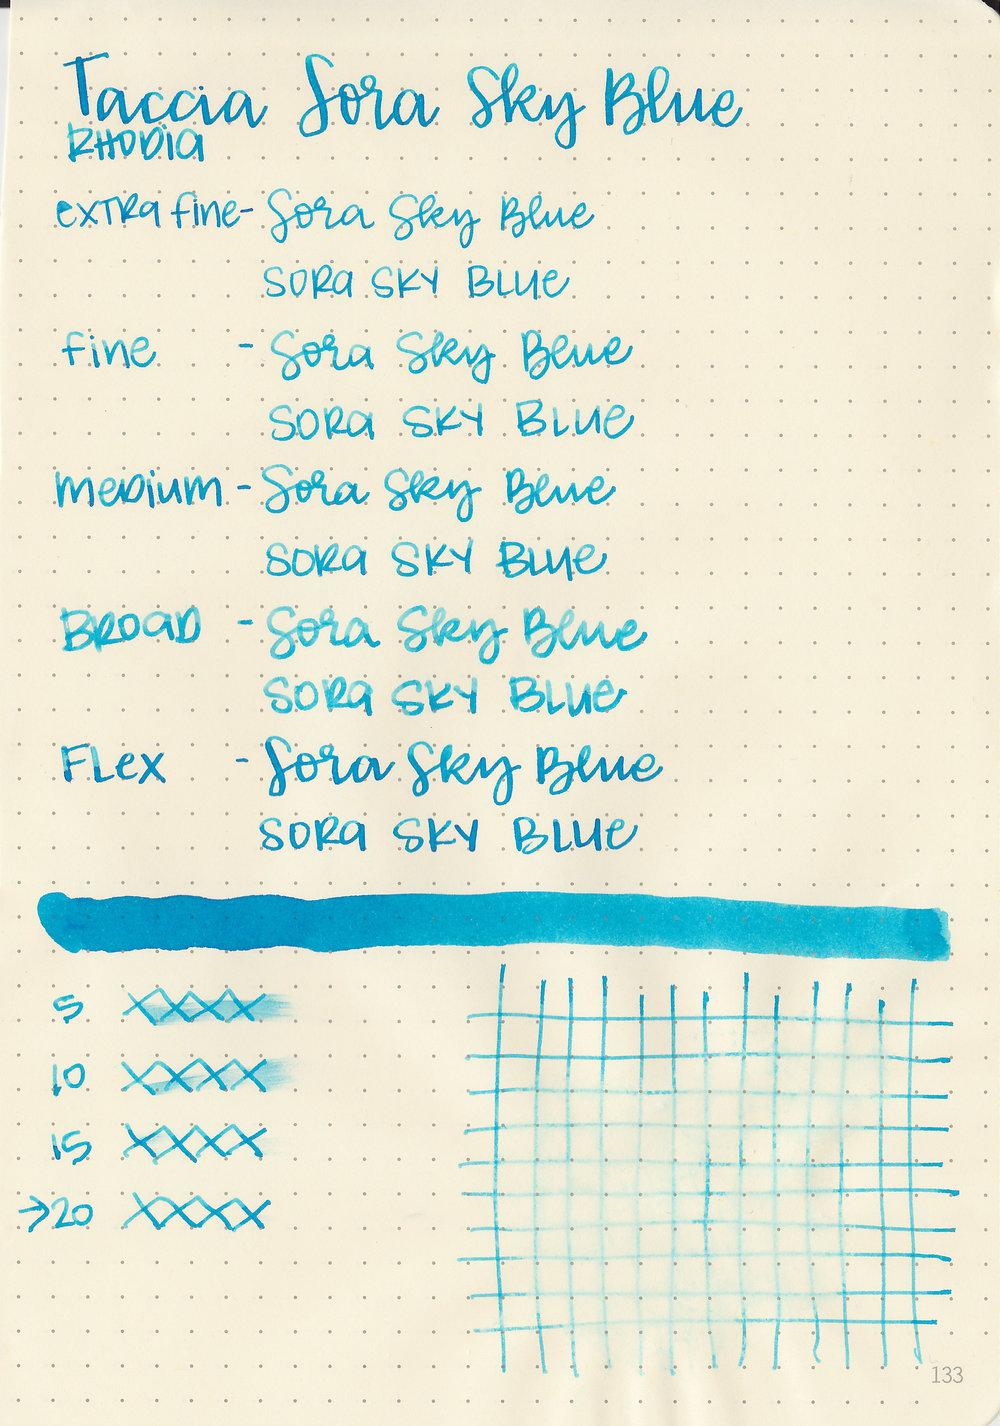 tac-sora-sky-blue-7.jpg